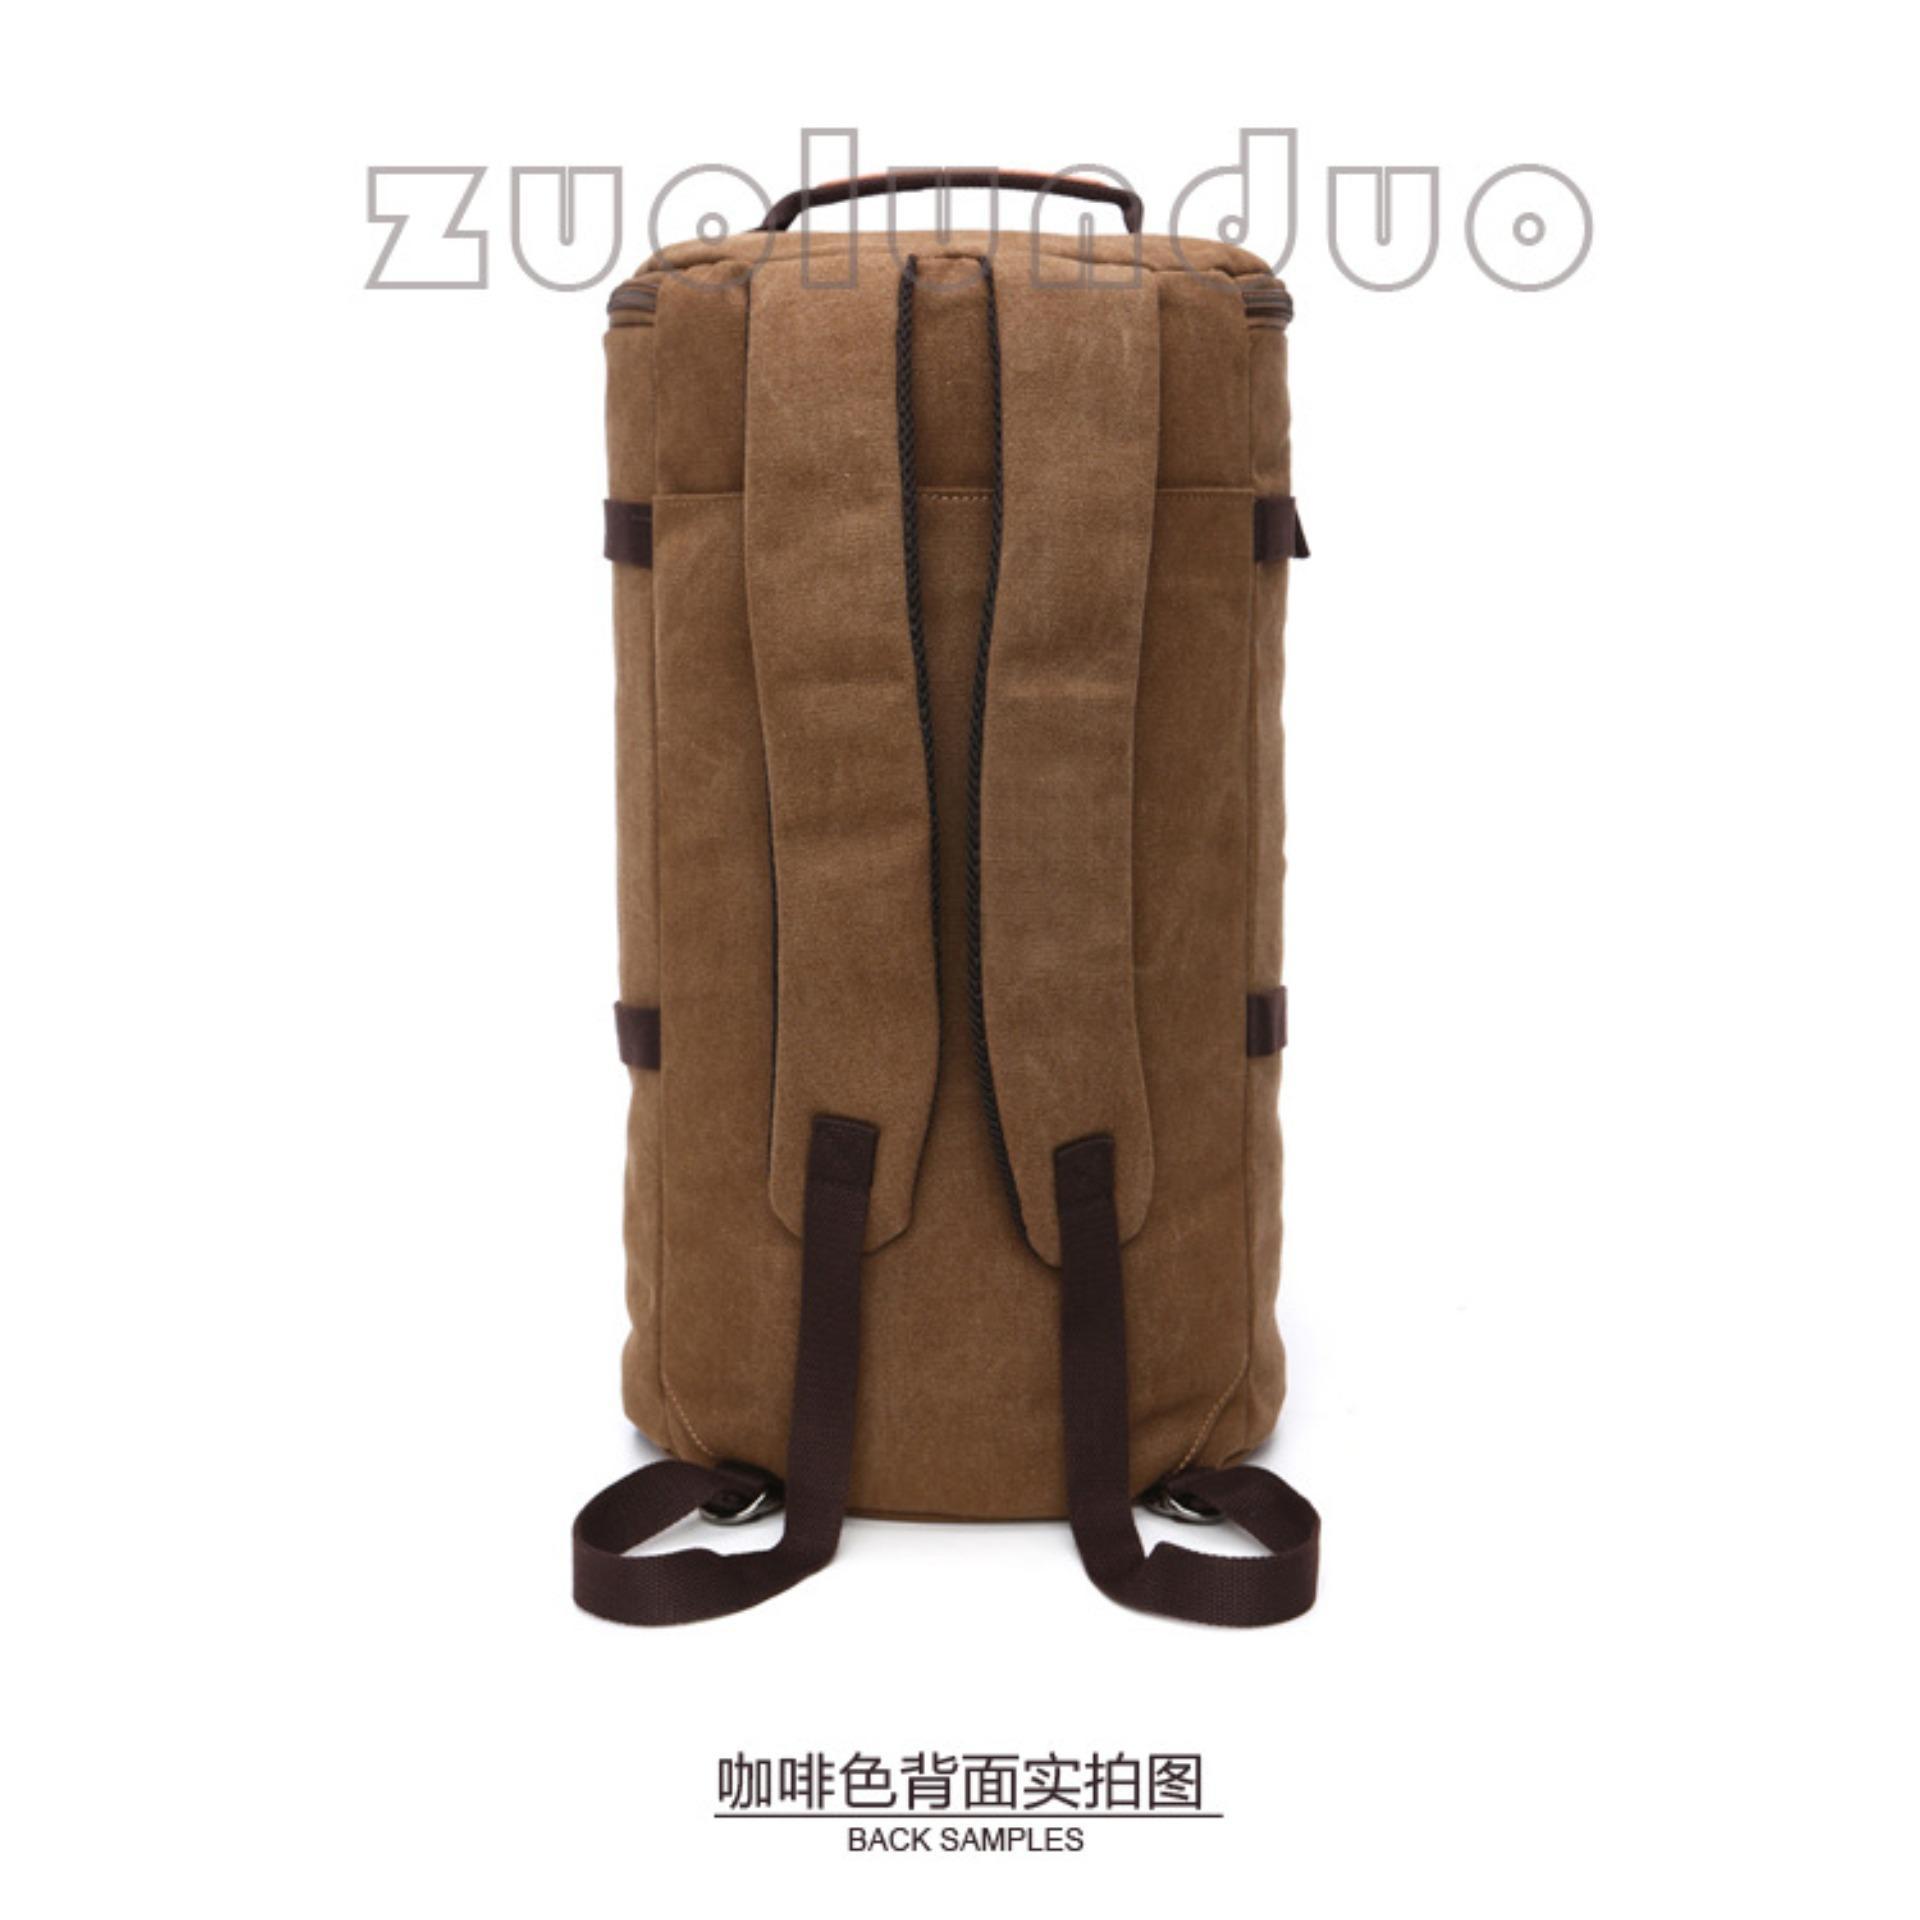 8206d4964e Tas ransel canvas pria tas tabung tas modis Tas punggung Tas selempang .